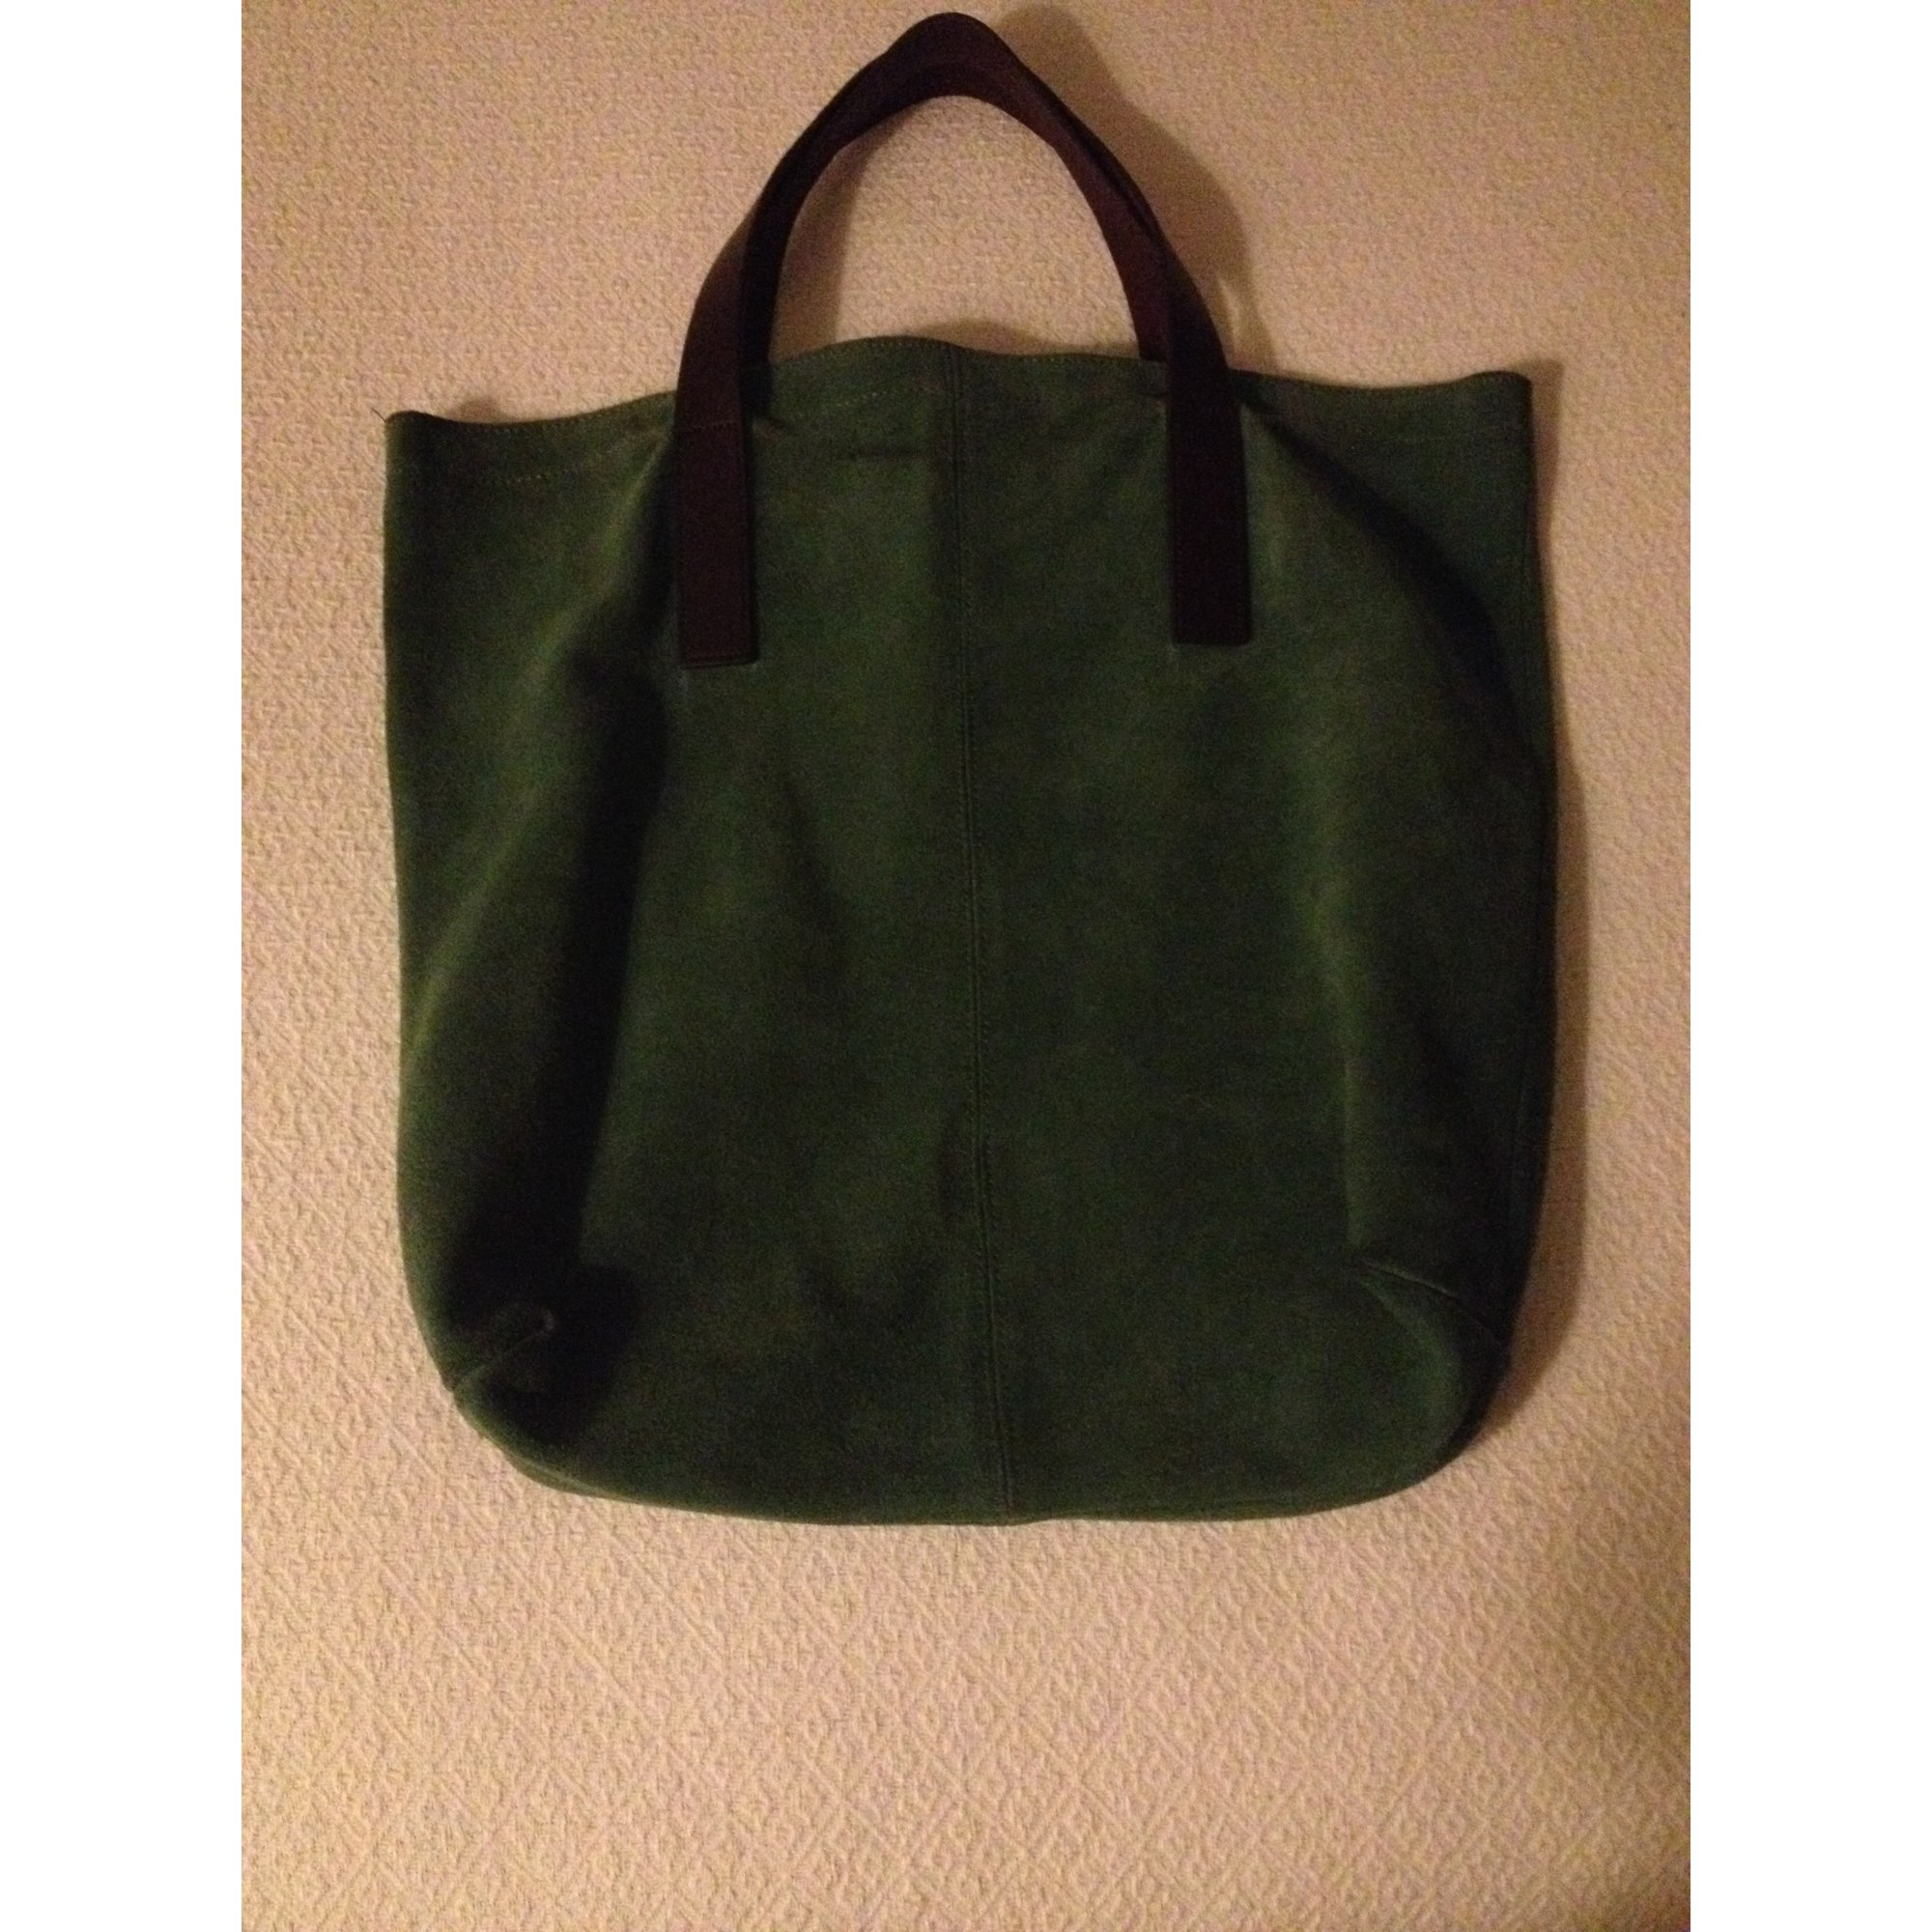 0c452d57b78c Sac à main en cuir MONOPRIX vert vendu par Vide dressing d ataline ...